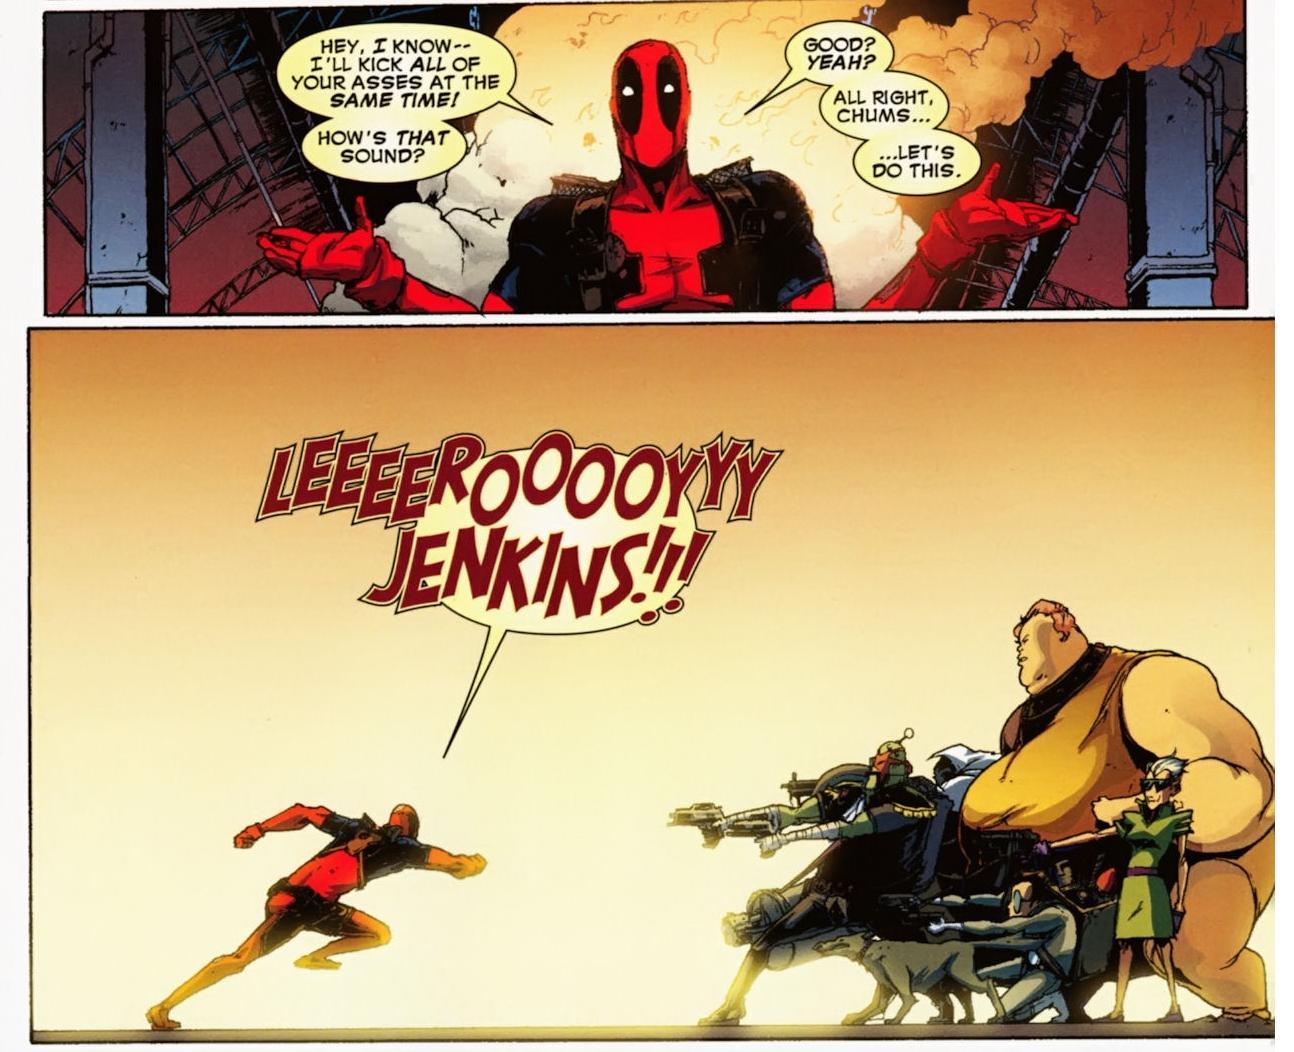 Deadpool/warcraft